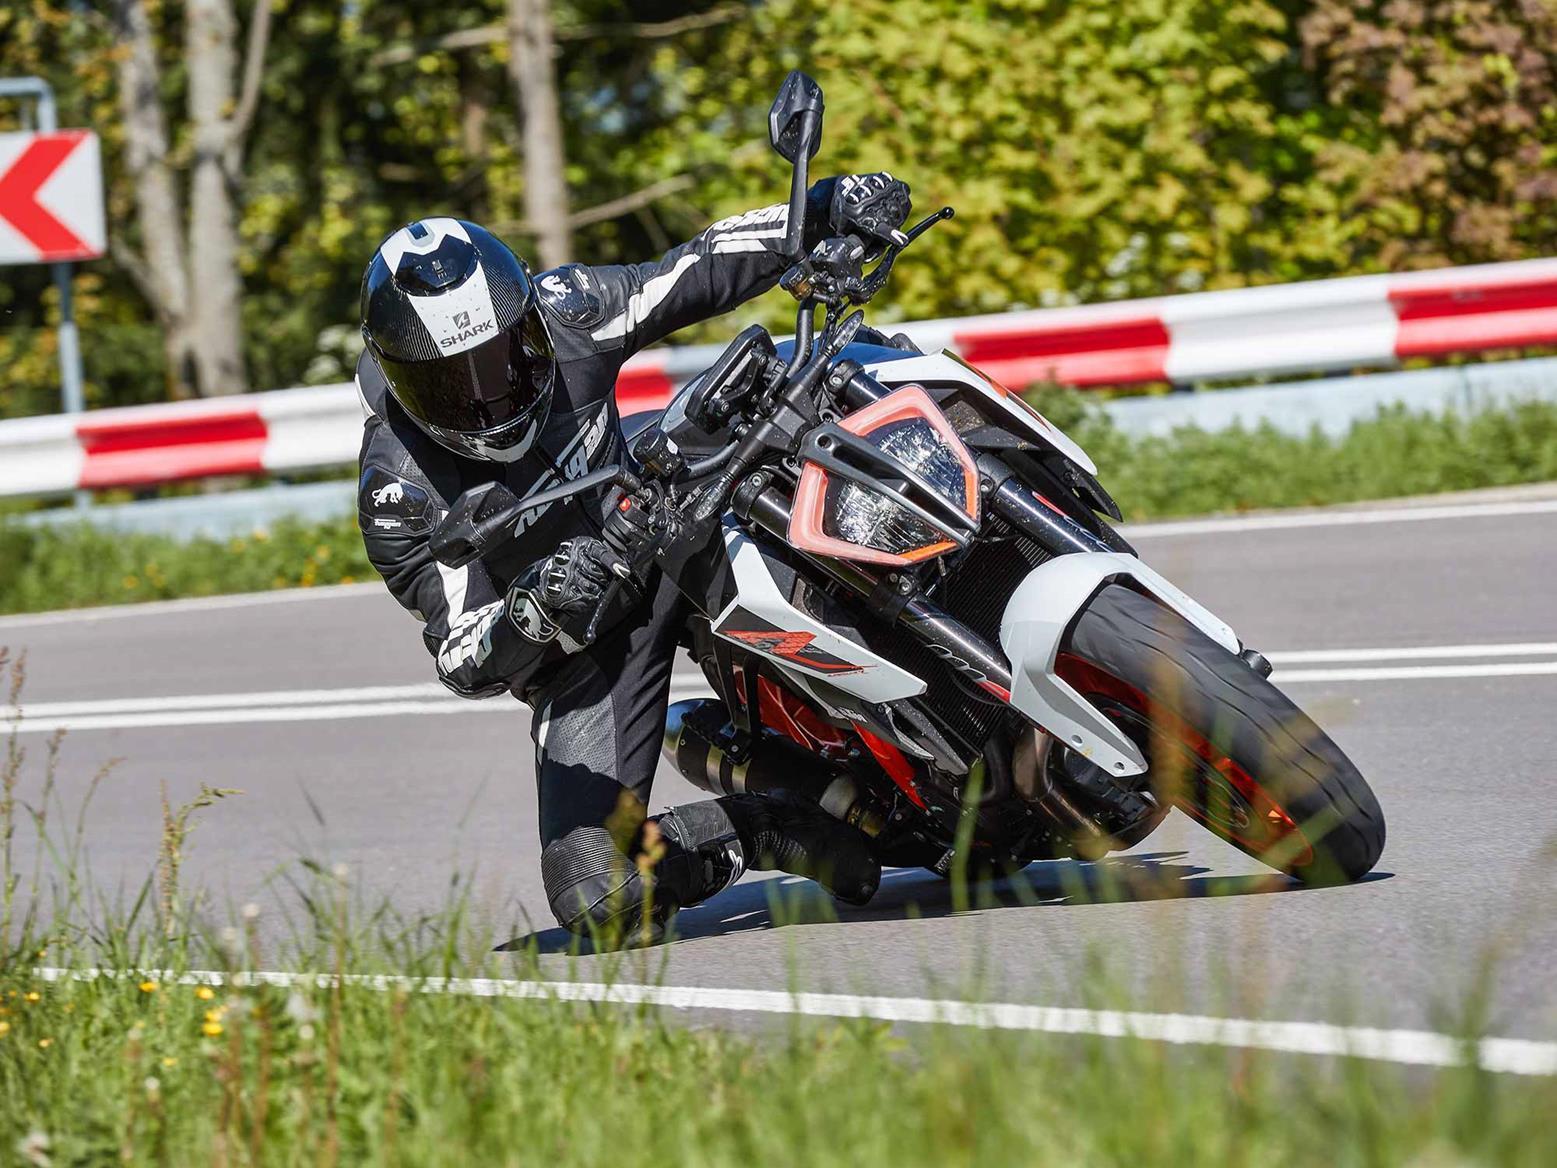 Fast cornering on the KTM 1290 Super Duke R